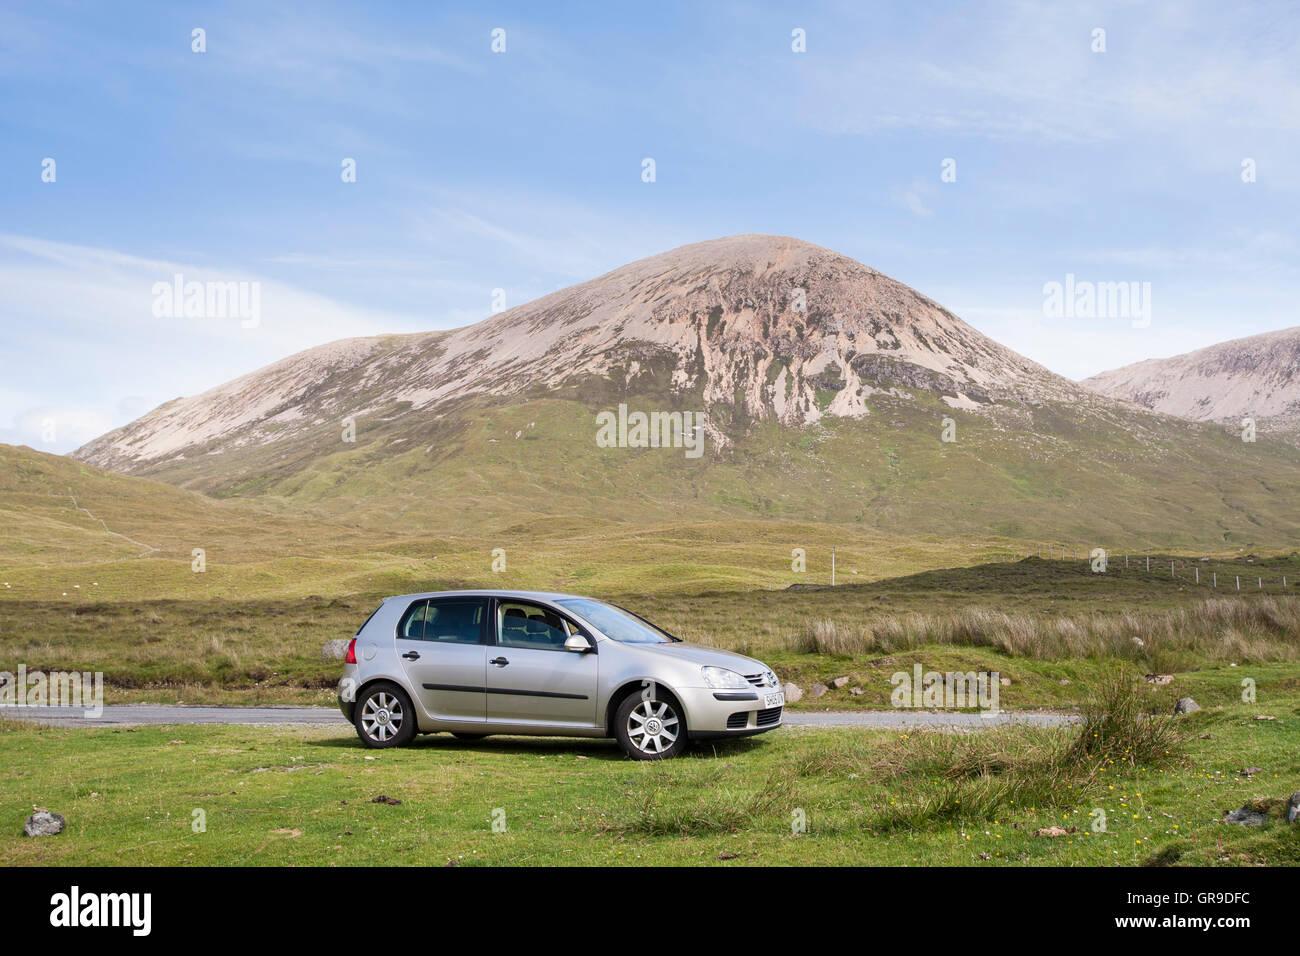 Volkswagen Golf car parked next to road with Beinn Dearg behind, Strathaird, Isle of Skye, Scotland, United Kingdom - Stock Image